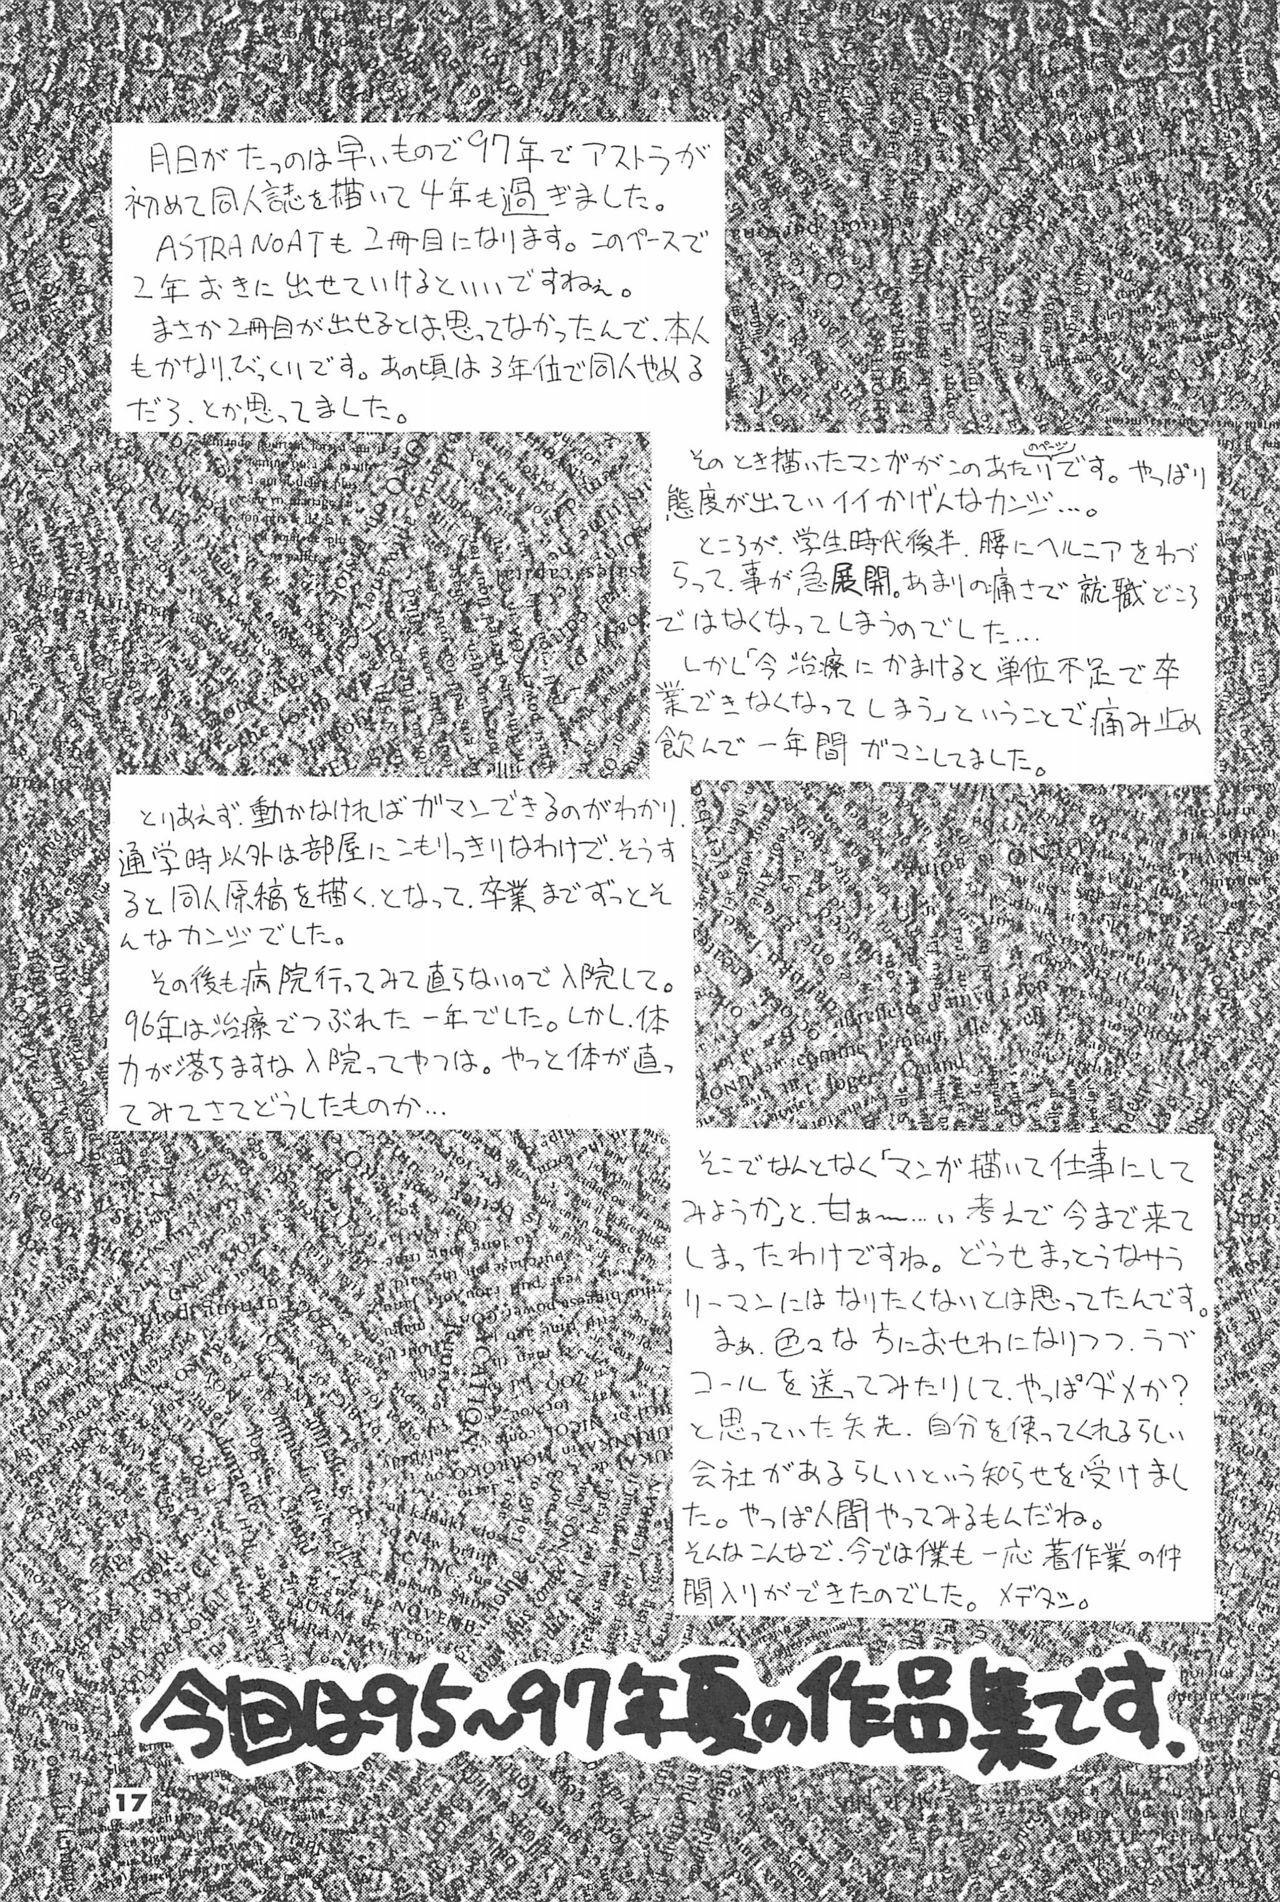 ASTRA NOAT 2 18